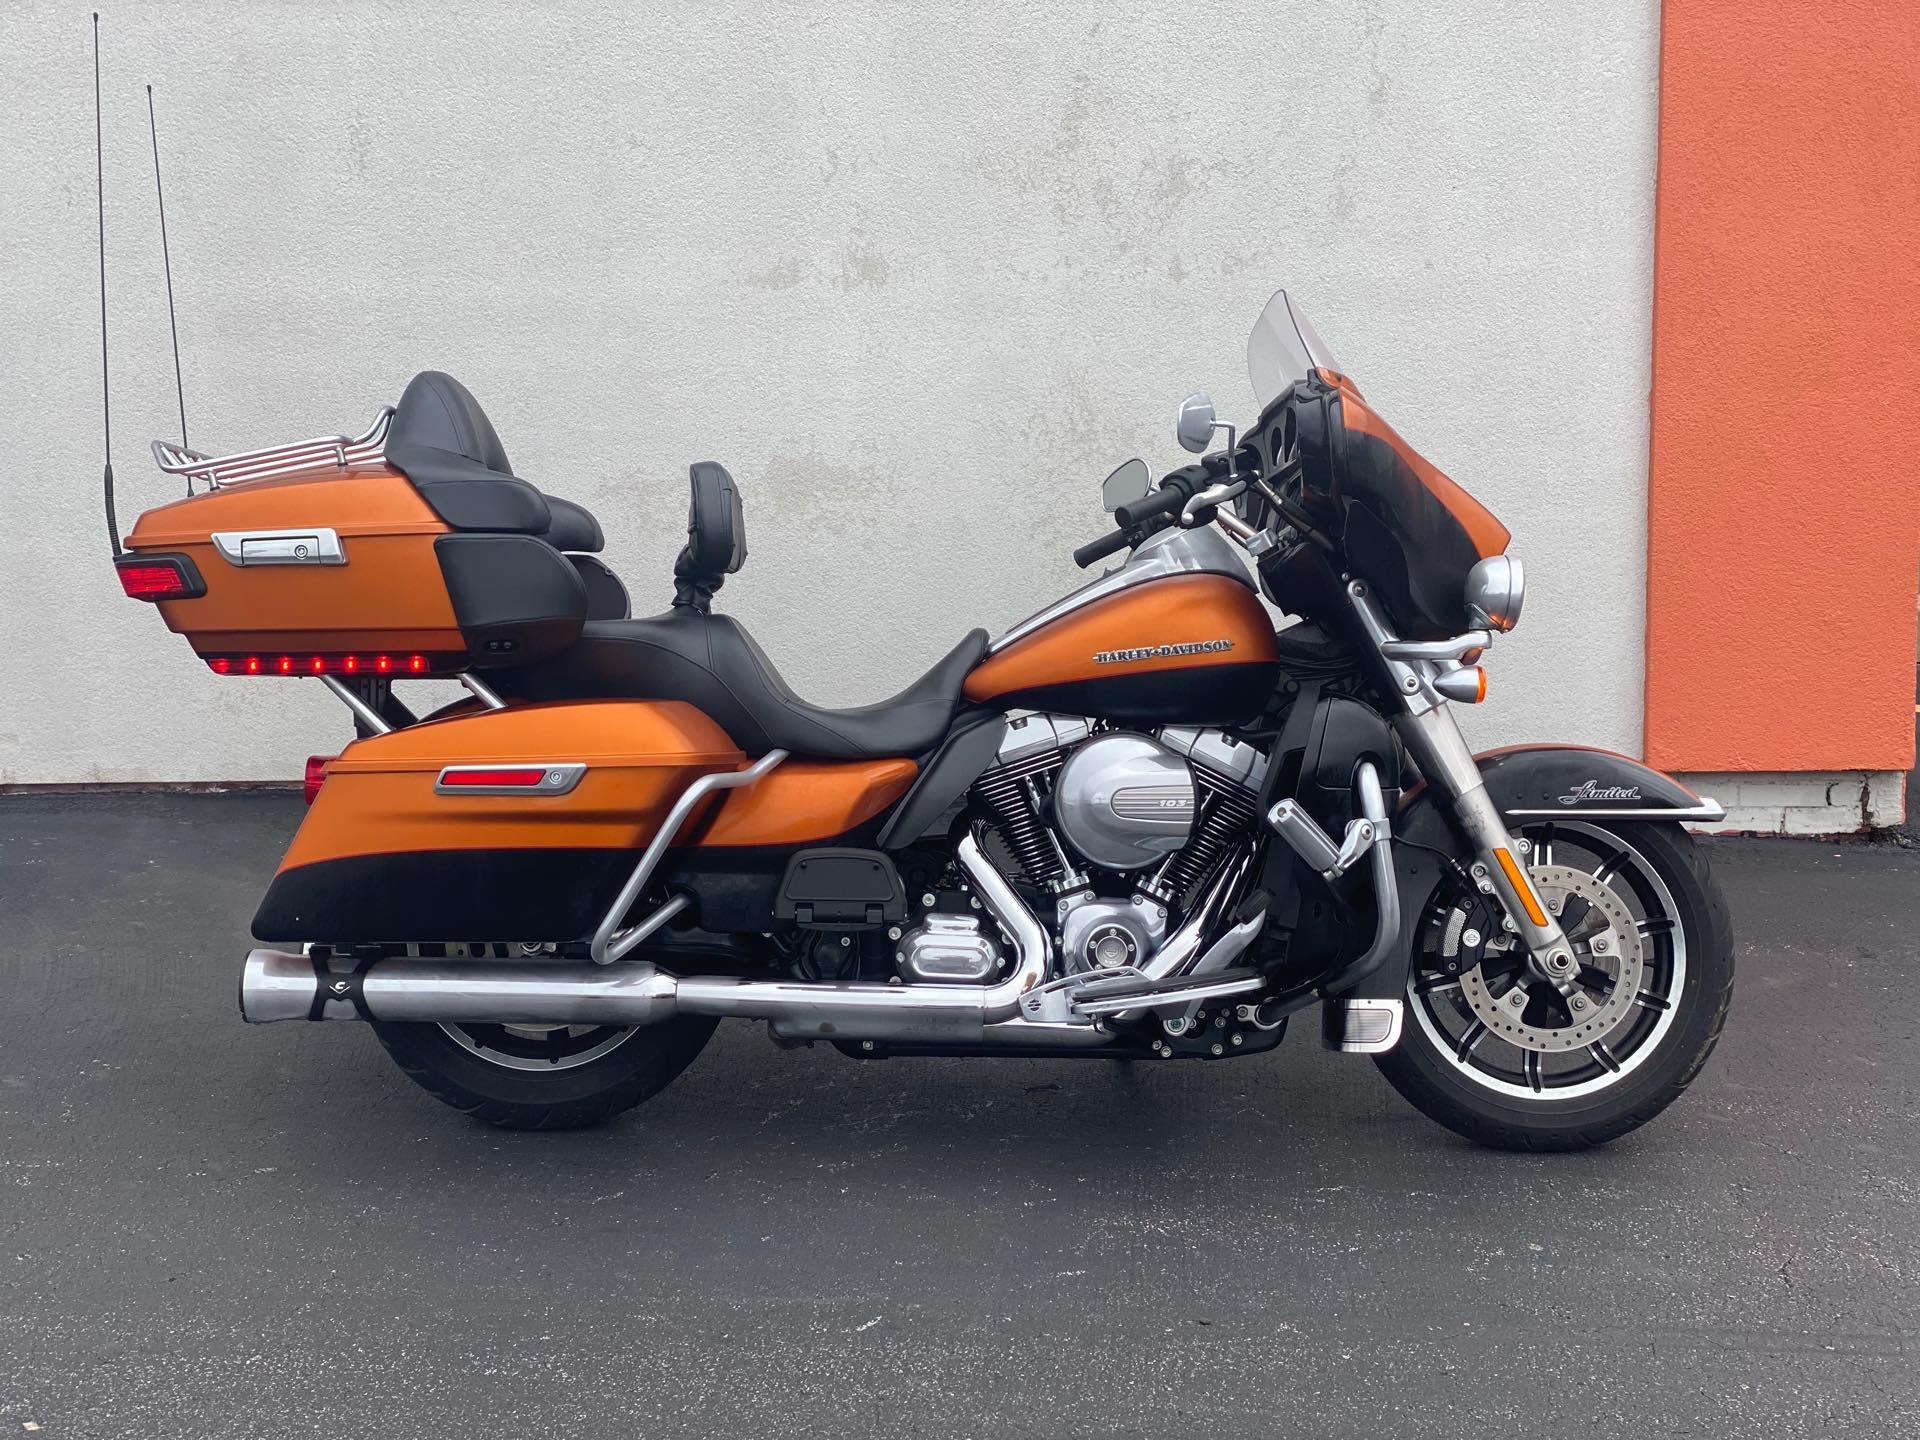 2015 Harley-Davidson Electra Glide Ultra Limited Low at Thunder Harley-Davidson